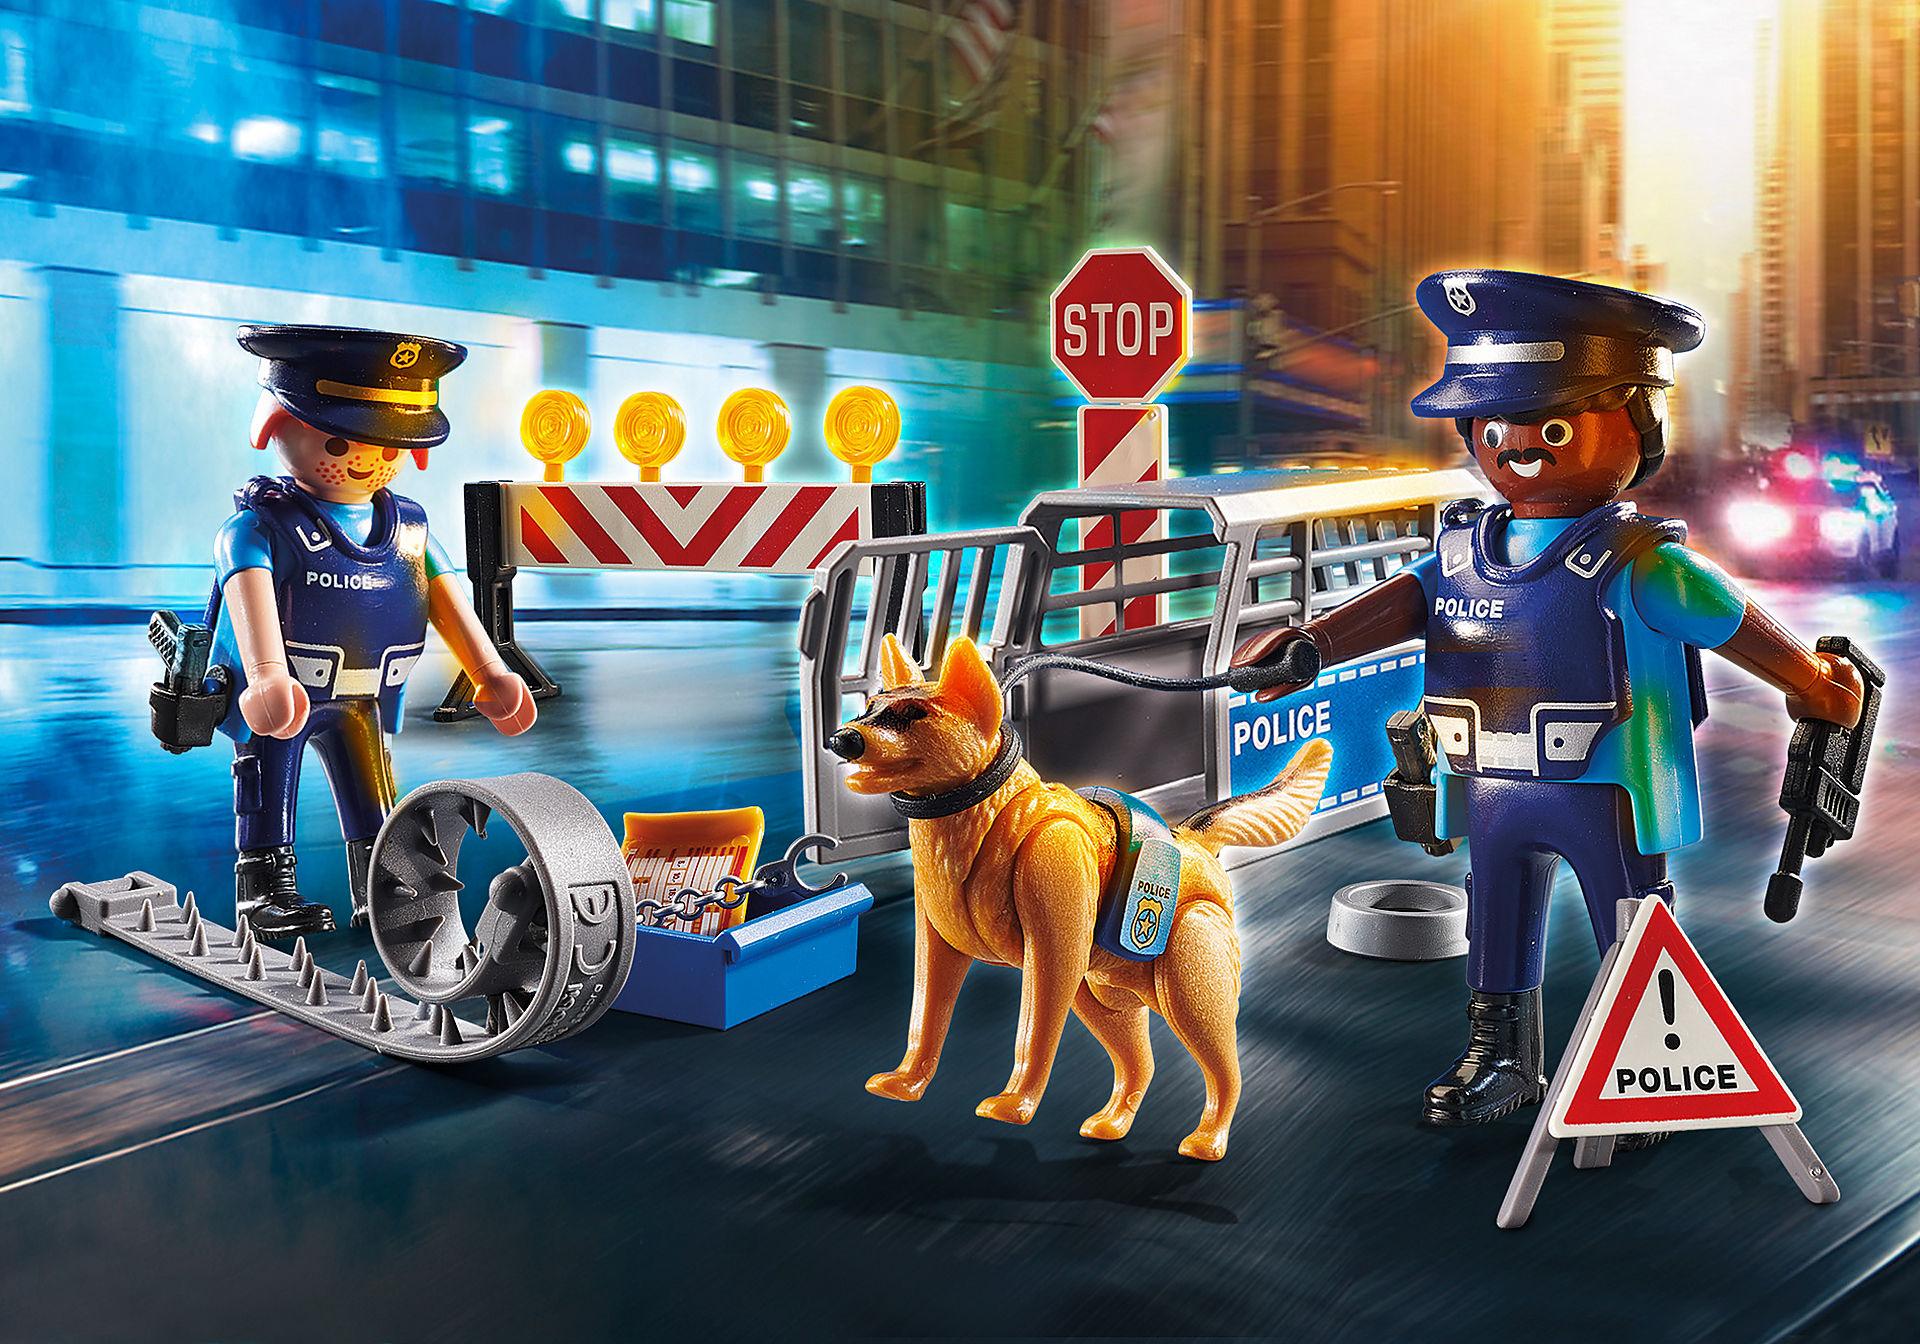 http://media.playmobil.com/i/playmobil/6924_product_detail/Politie wegversperring